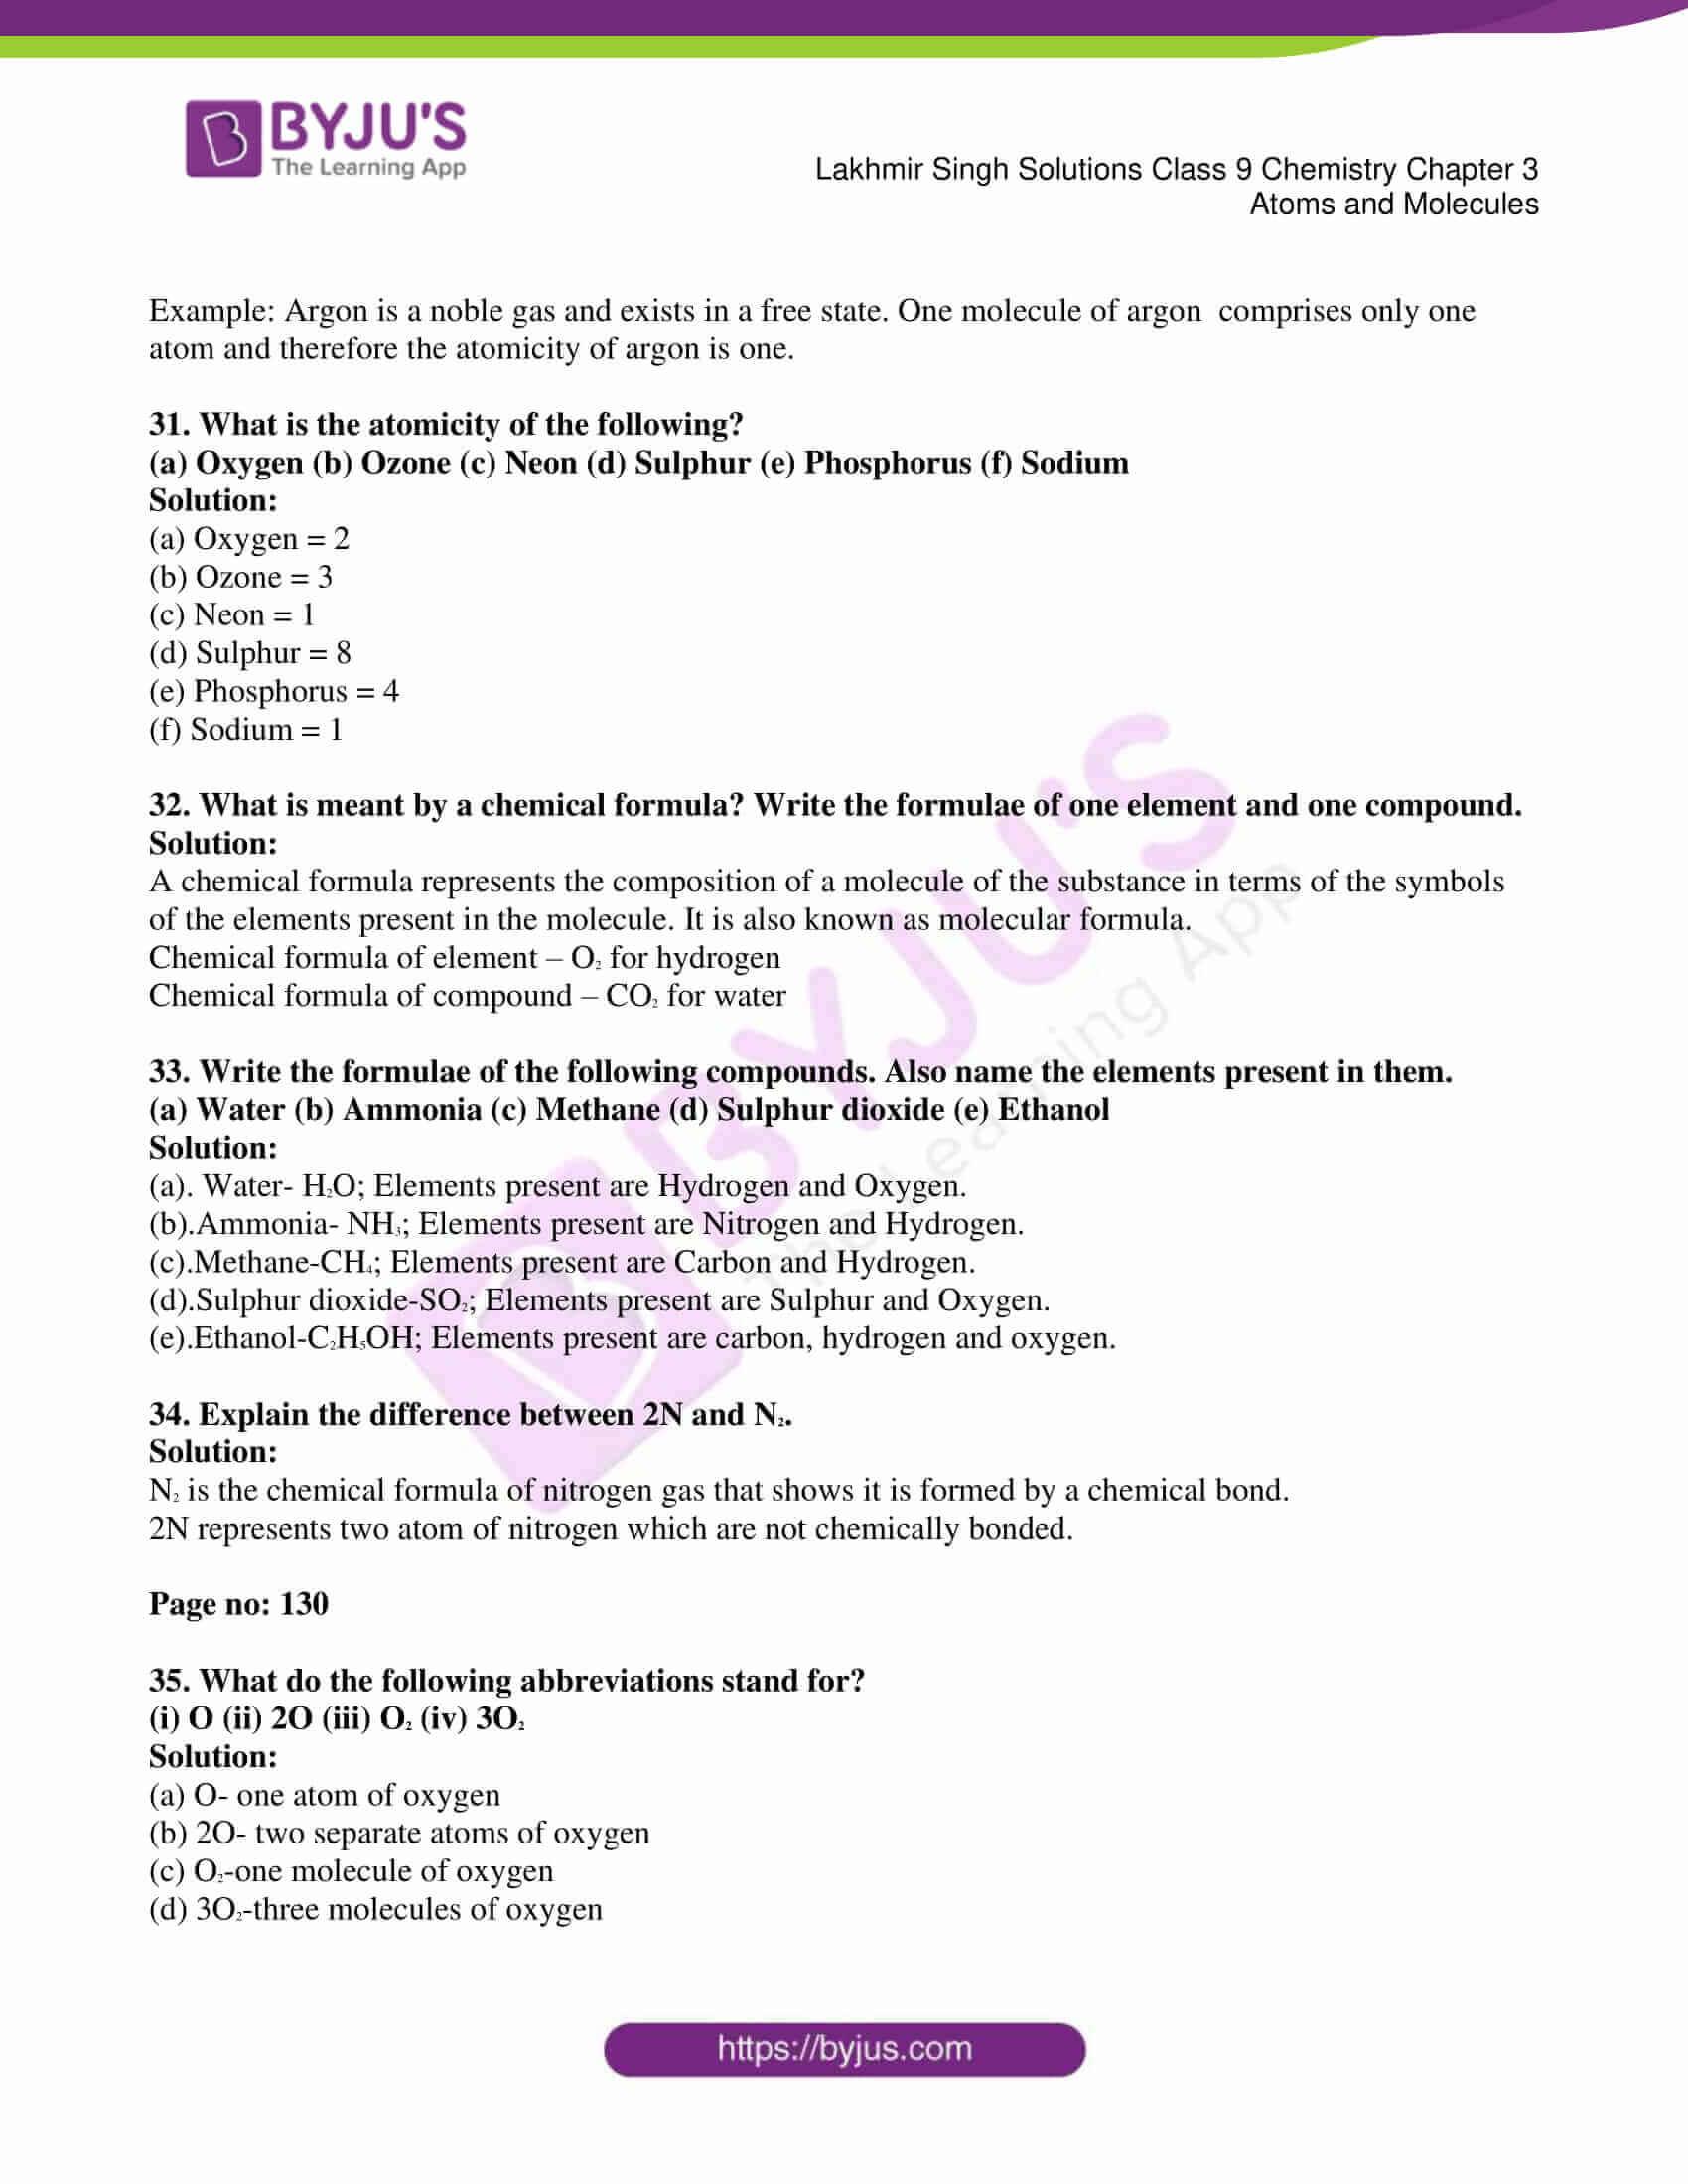 lakhmir singh solutions class 9 chemistry chapter 3 05